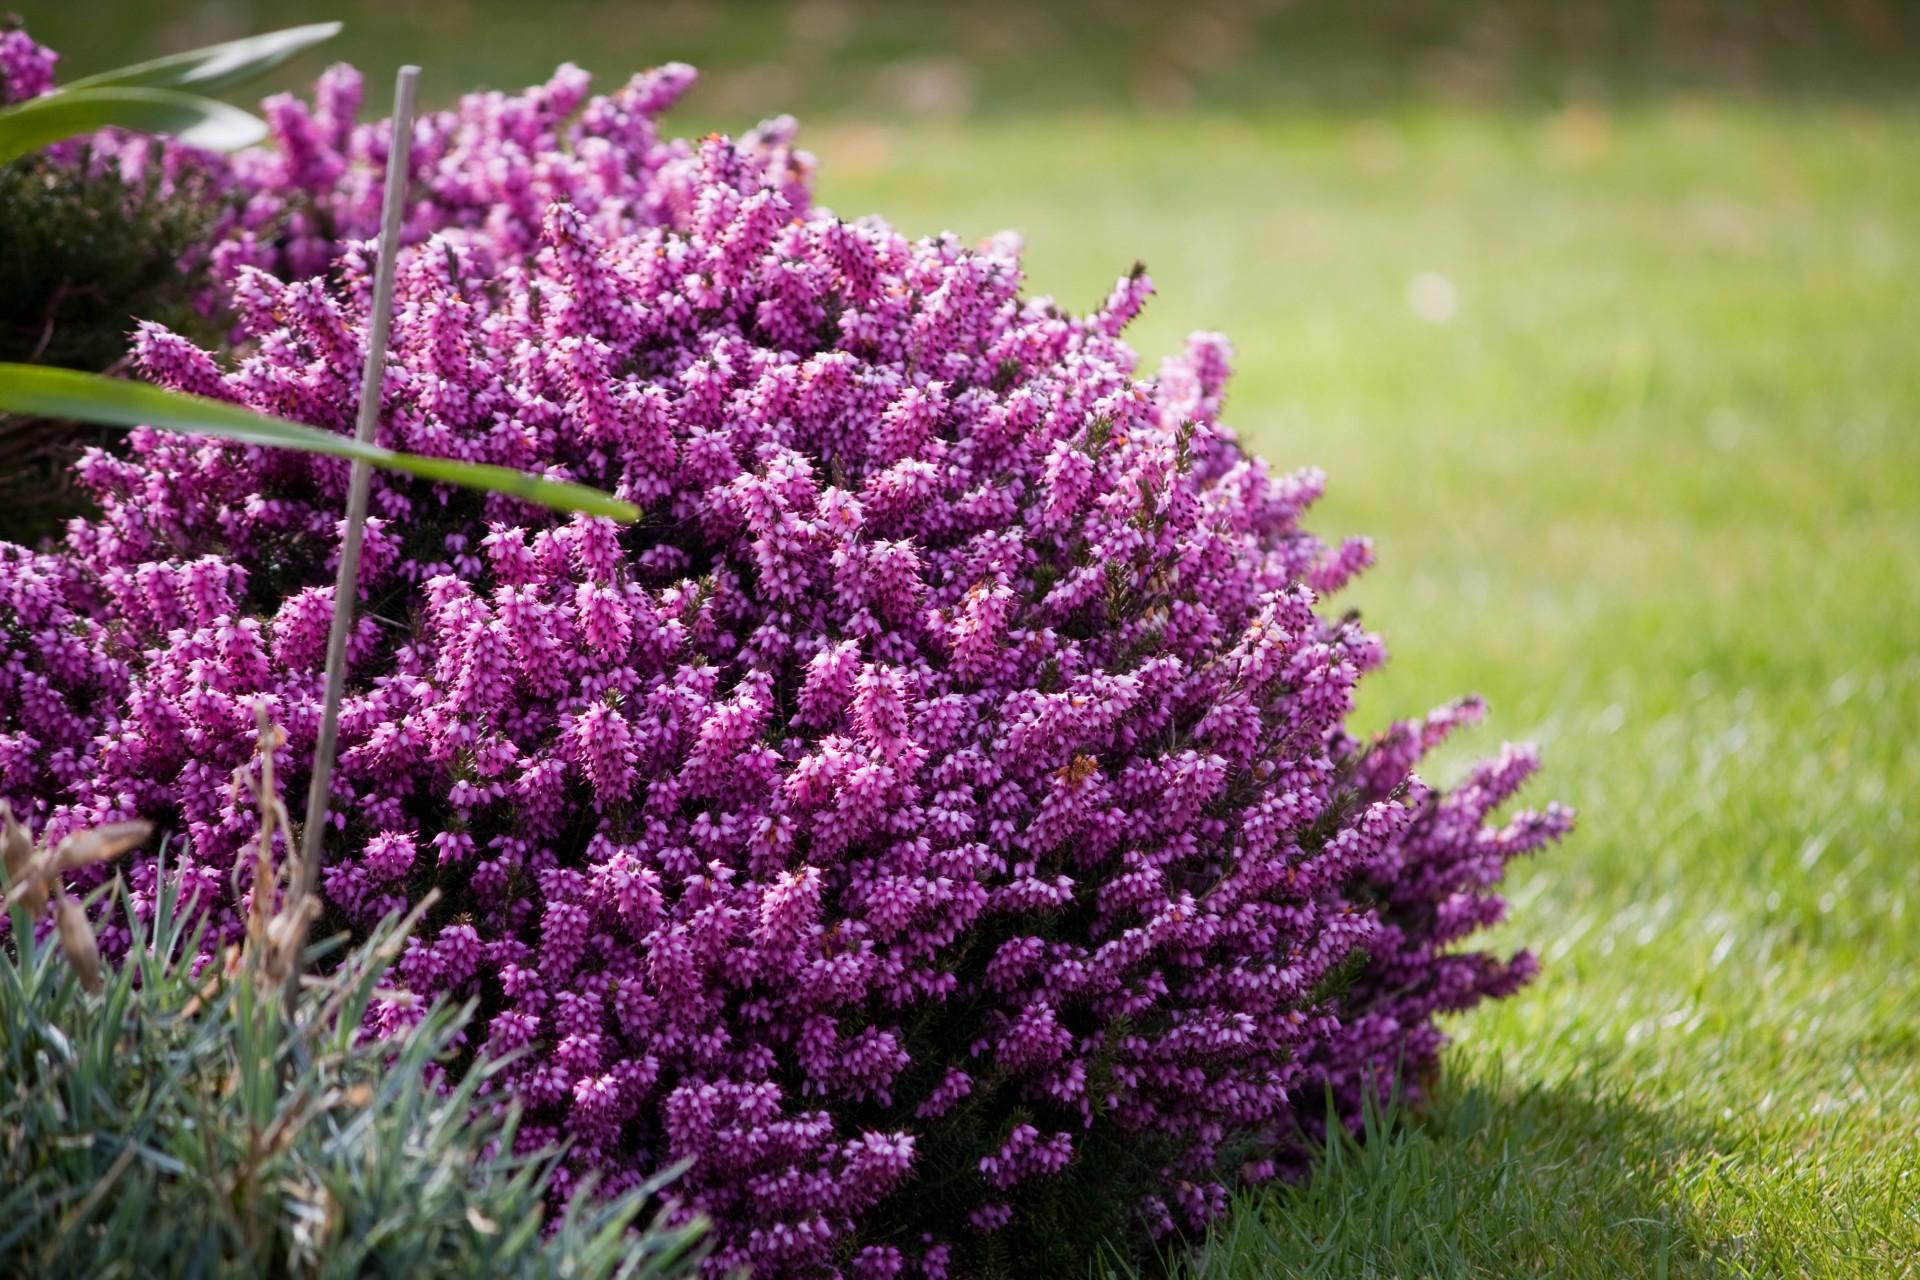 purple-heather-flowers